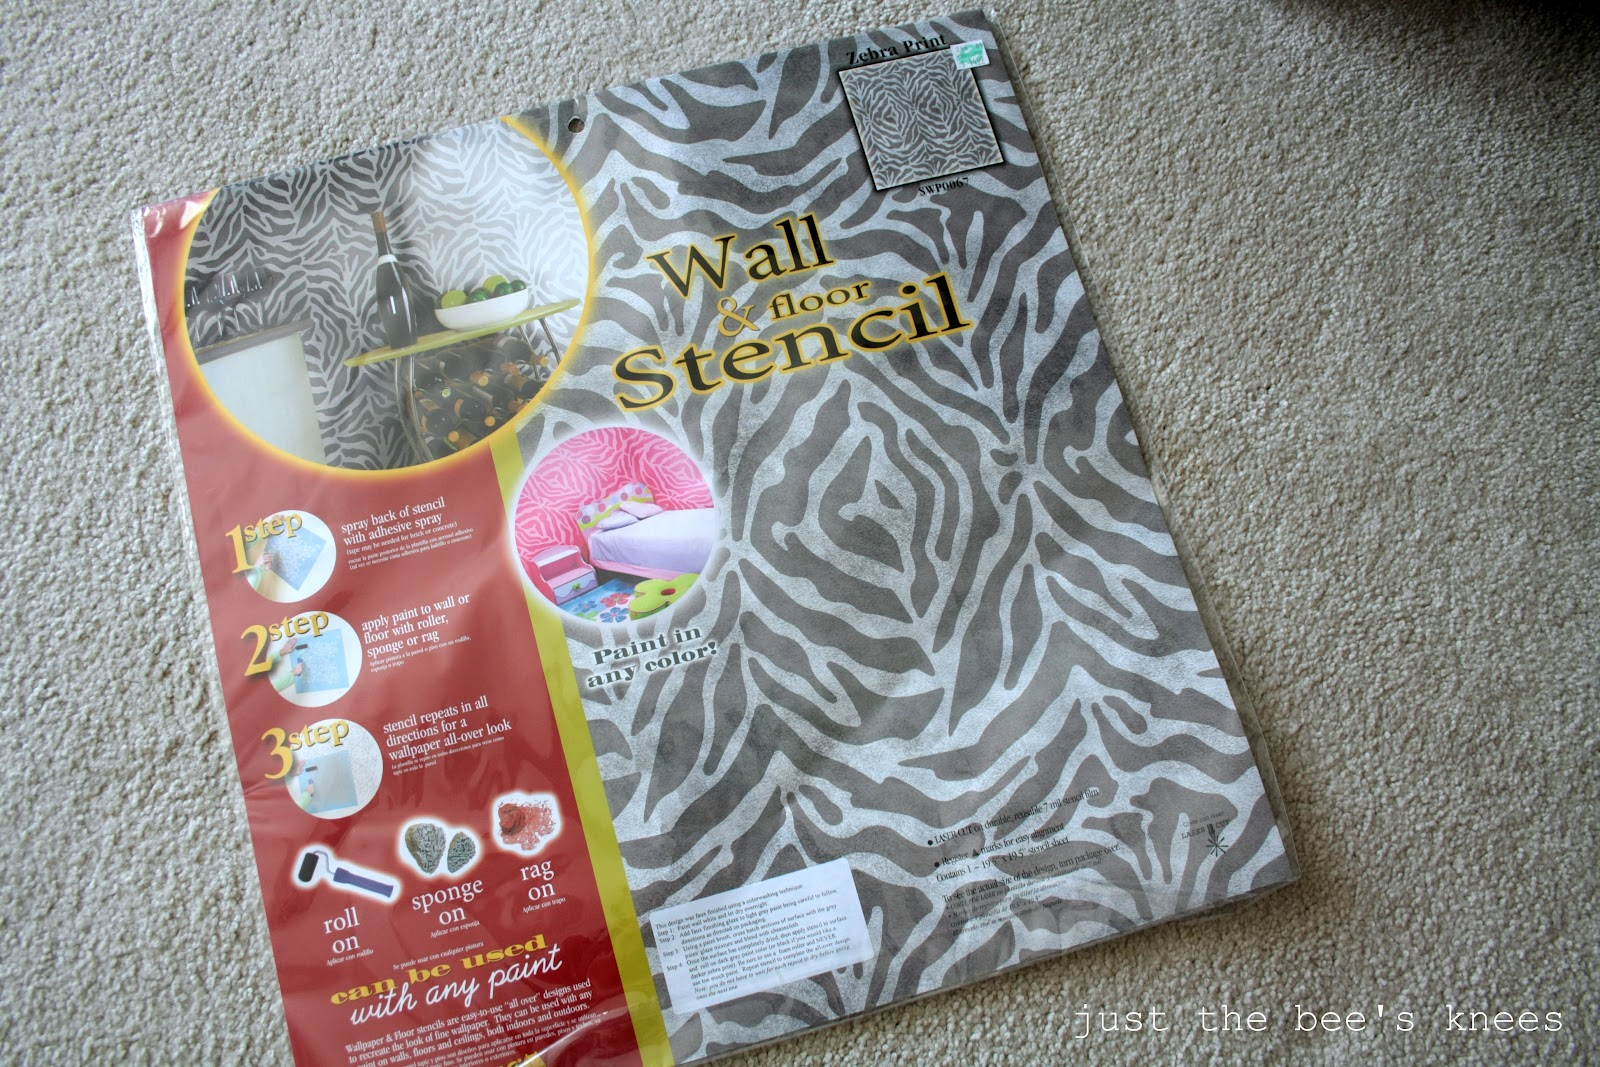 job royalcaribbean reviews africa plus co cutter manager mat tag lobby mats hob south lob hobby board